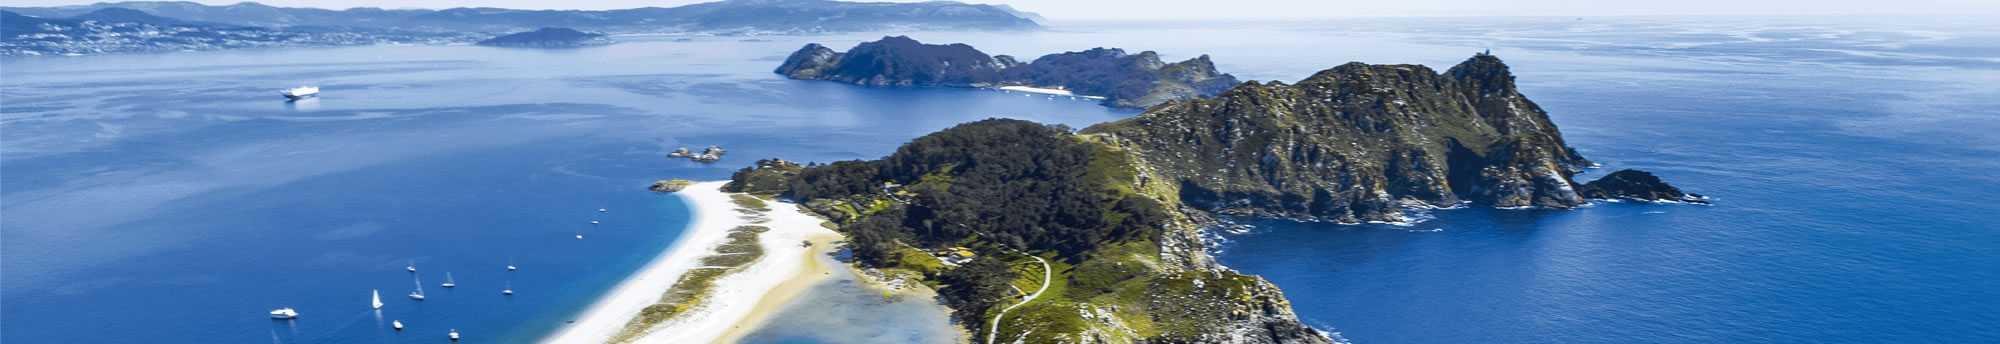 Hotel + Bilhetes para Viagem às Ilhas Cíes